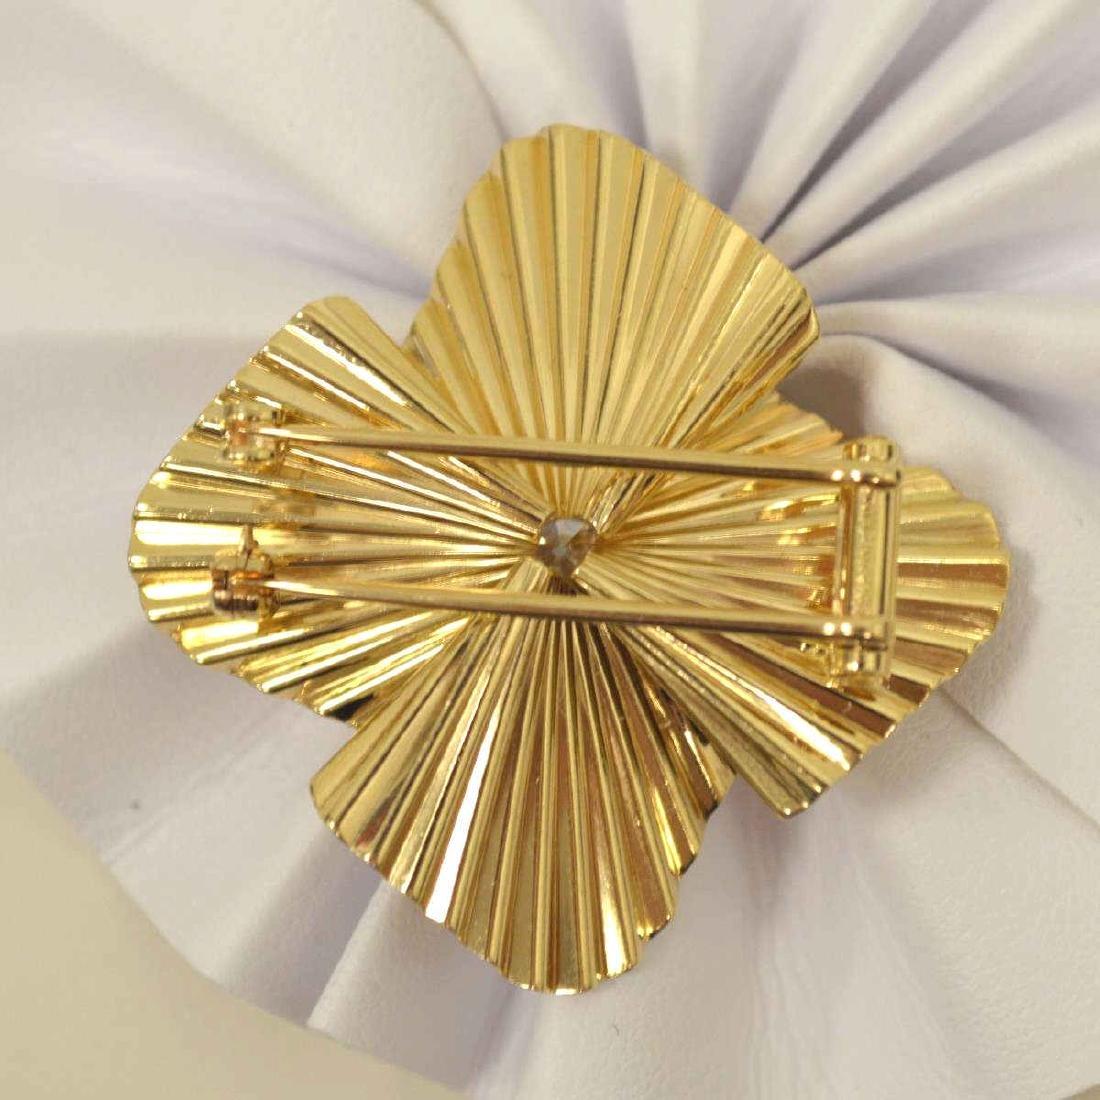 14kt Old European cut diamond pendant by Tiffany - 4